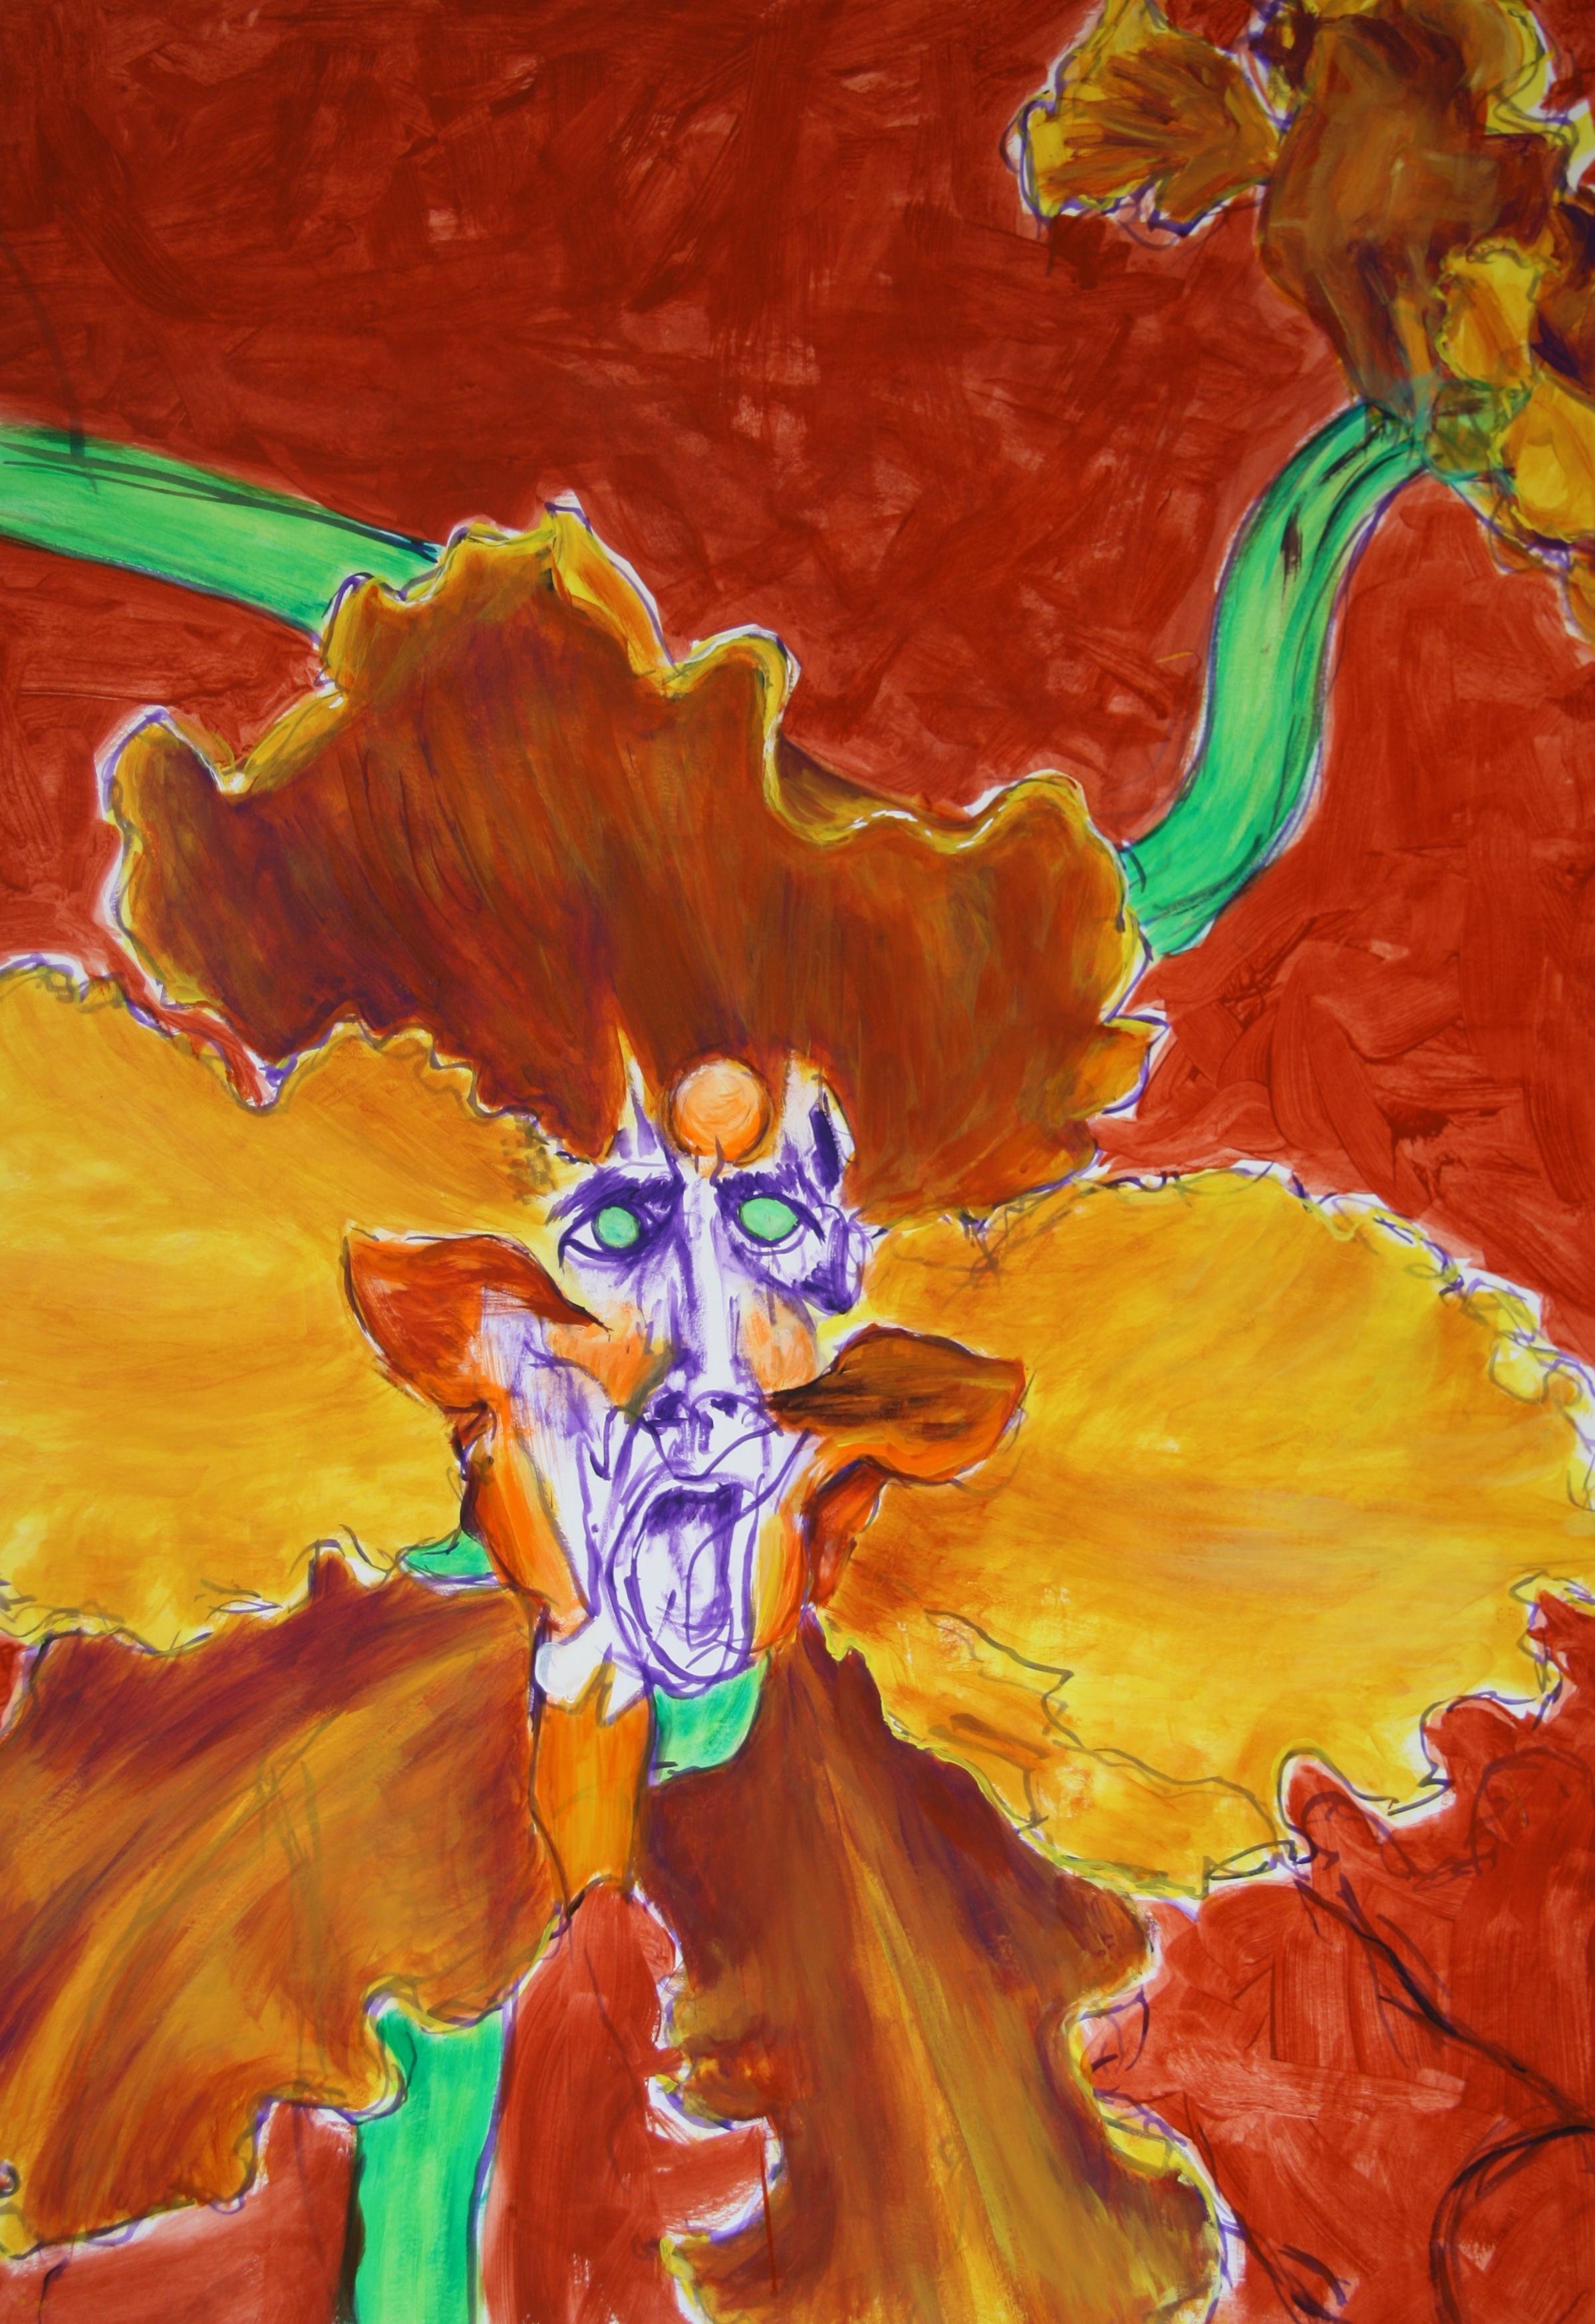 Die Begeisterte Blume 1, 100x70cm, acrylic on paper